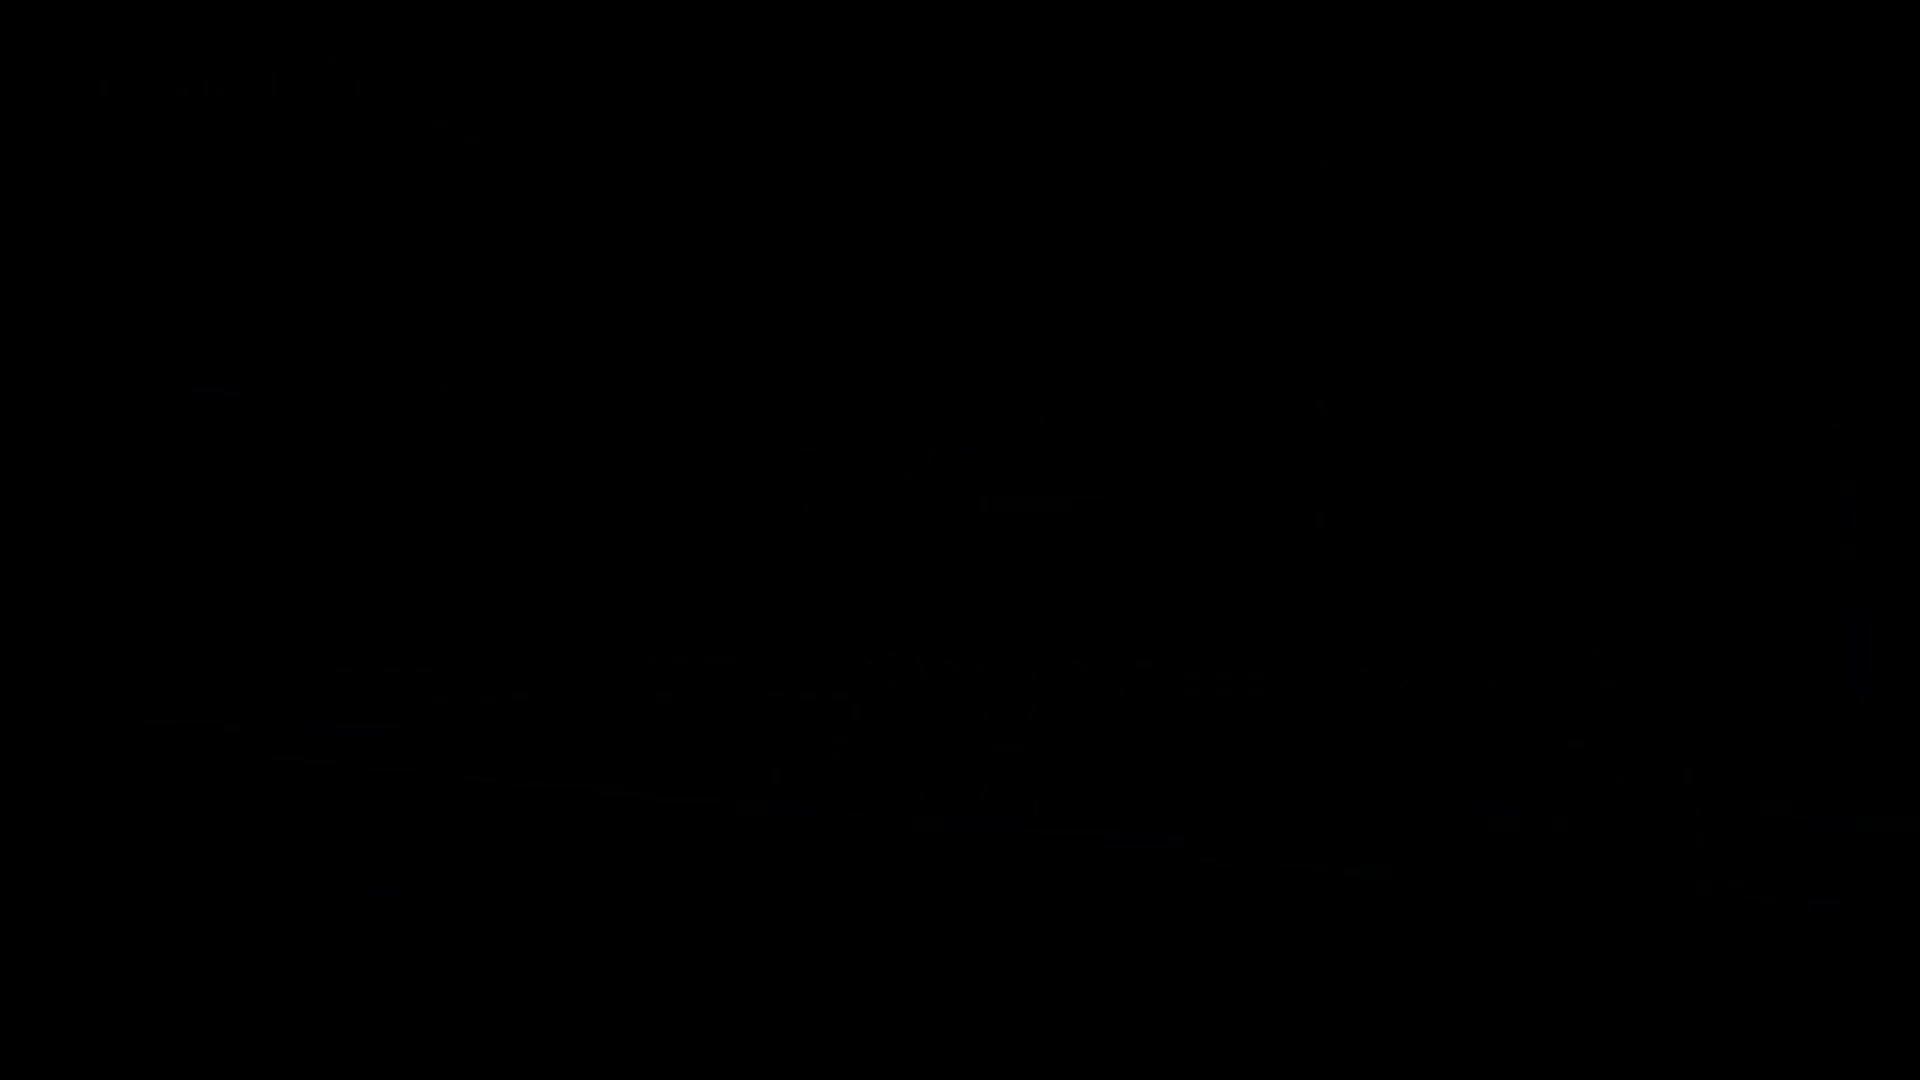 cd projekt red, cdpr, cyberpunk, cyberpunk 2077, cyberpunk 2077 official trailer, cyberpunk 2077 trailer, cyberpunk cdpr, cyberpunk game, e3 2019, game, games, gaming, juego, keanu, keanu reeves, keanu reeves e3 2019, keanu reeves microsoft, keanu reeves microsoft 2019, video game, witcher, Cyberpunk 2077 - Keanu Reeves On Stage   Microsoft Xbox E3 2019 GIFs